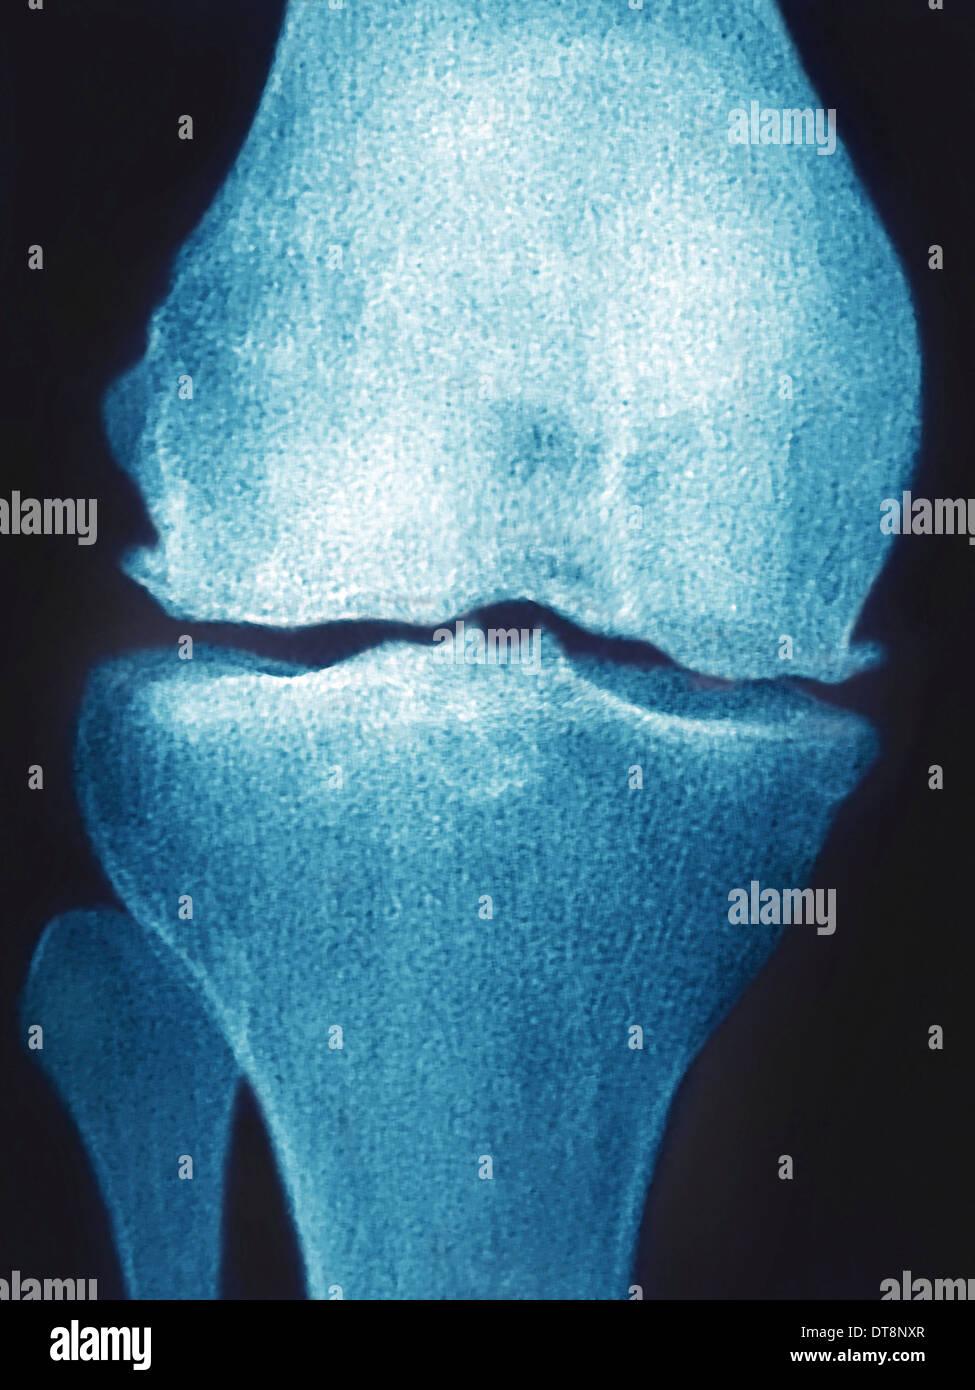 KNEE OSTEOARTHRITIS, X-RAY - Stock Image